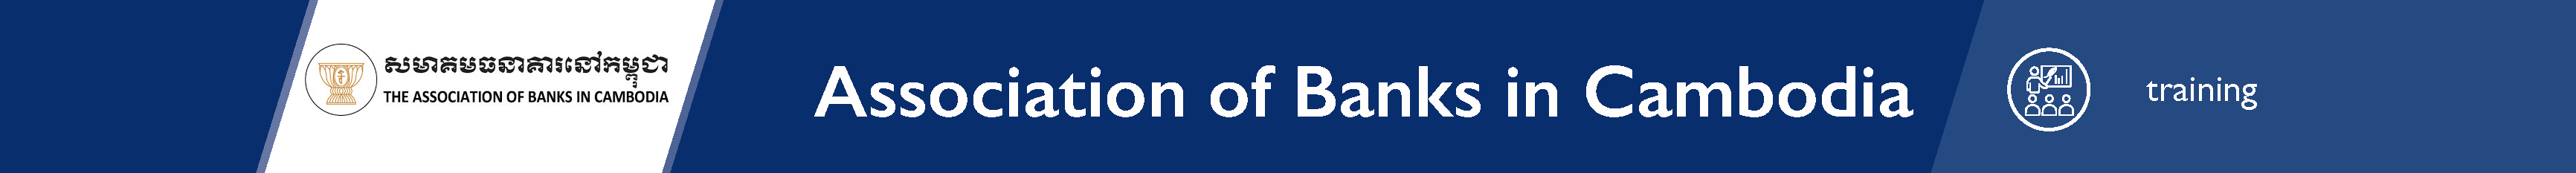 abc-bank